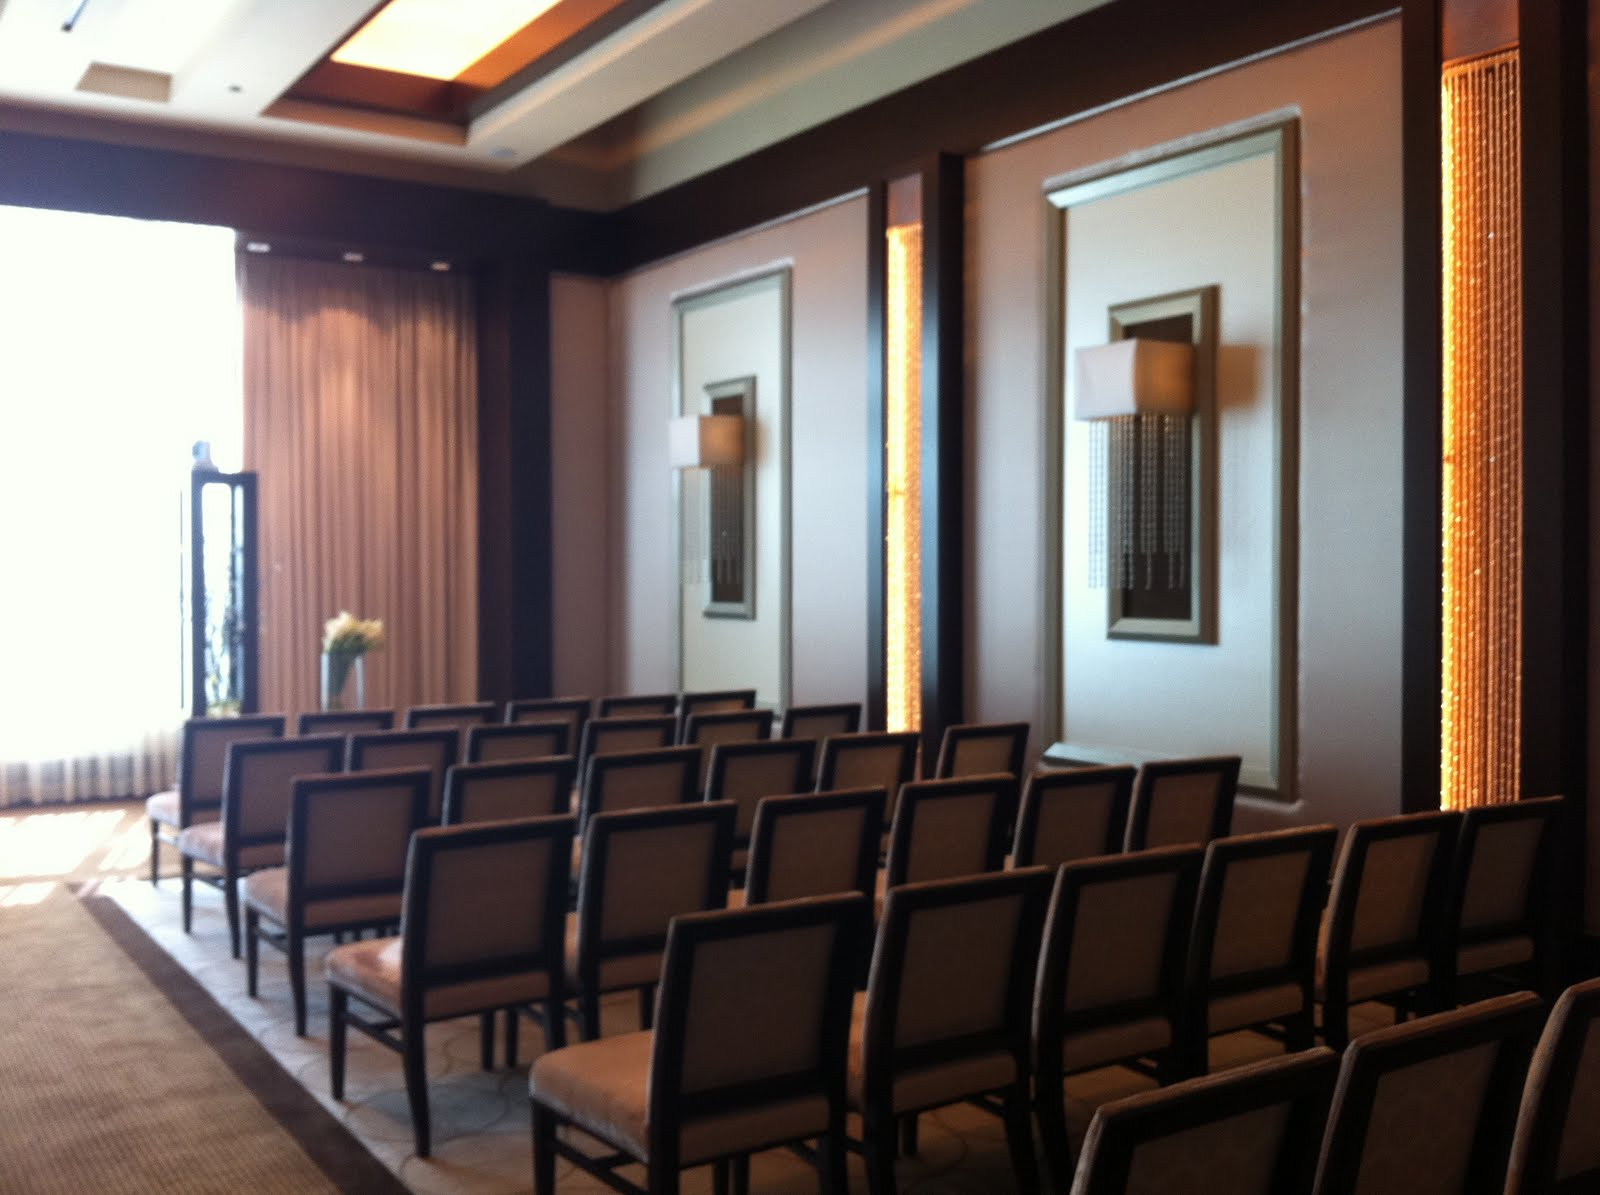 Simply weddings by brit bertino mandalay bay wedding chapel mandalay bay wedding chapel junglespirit Images